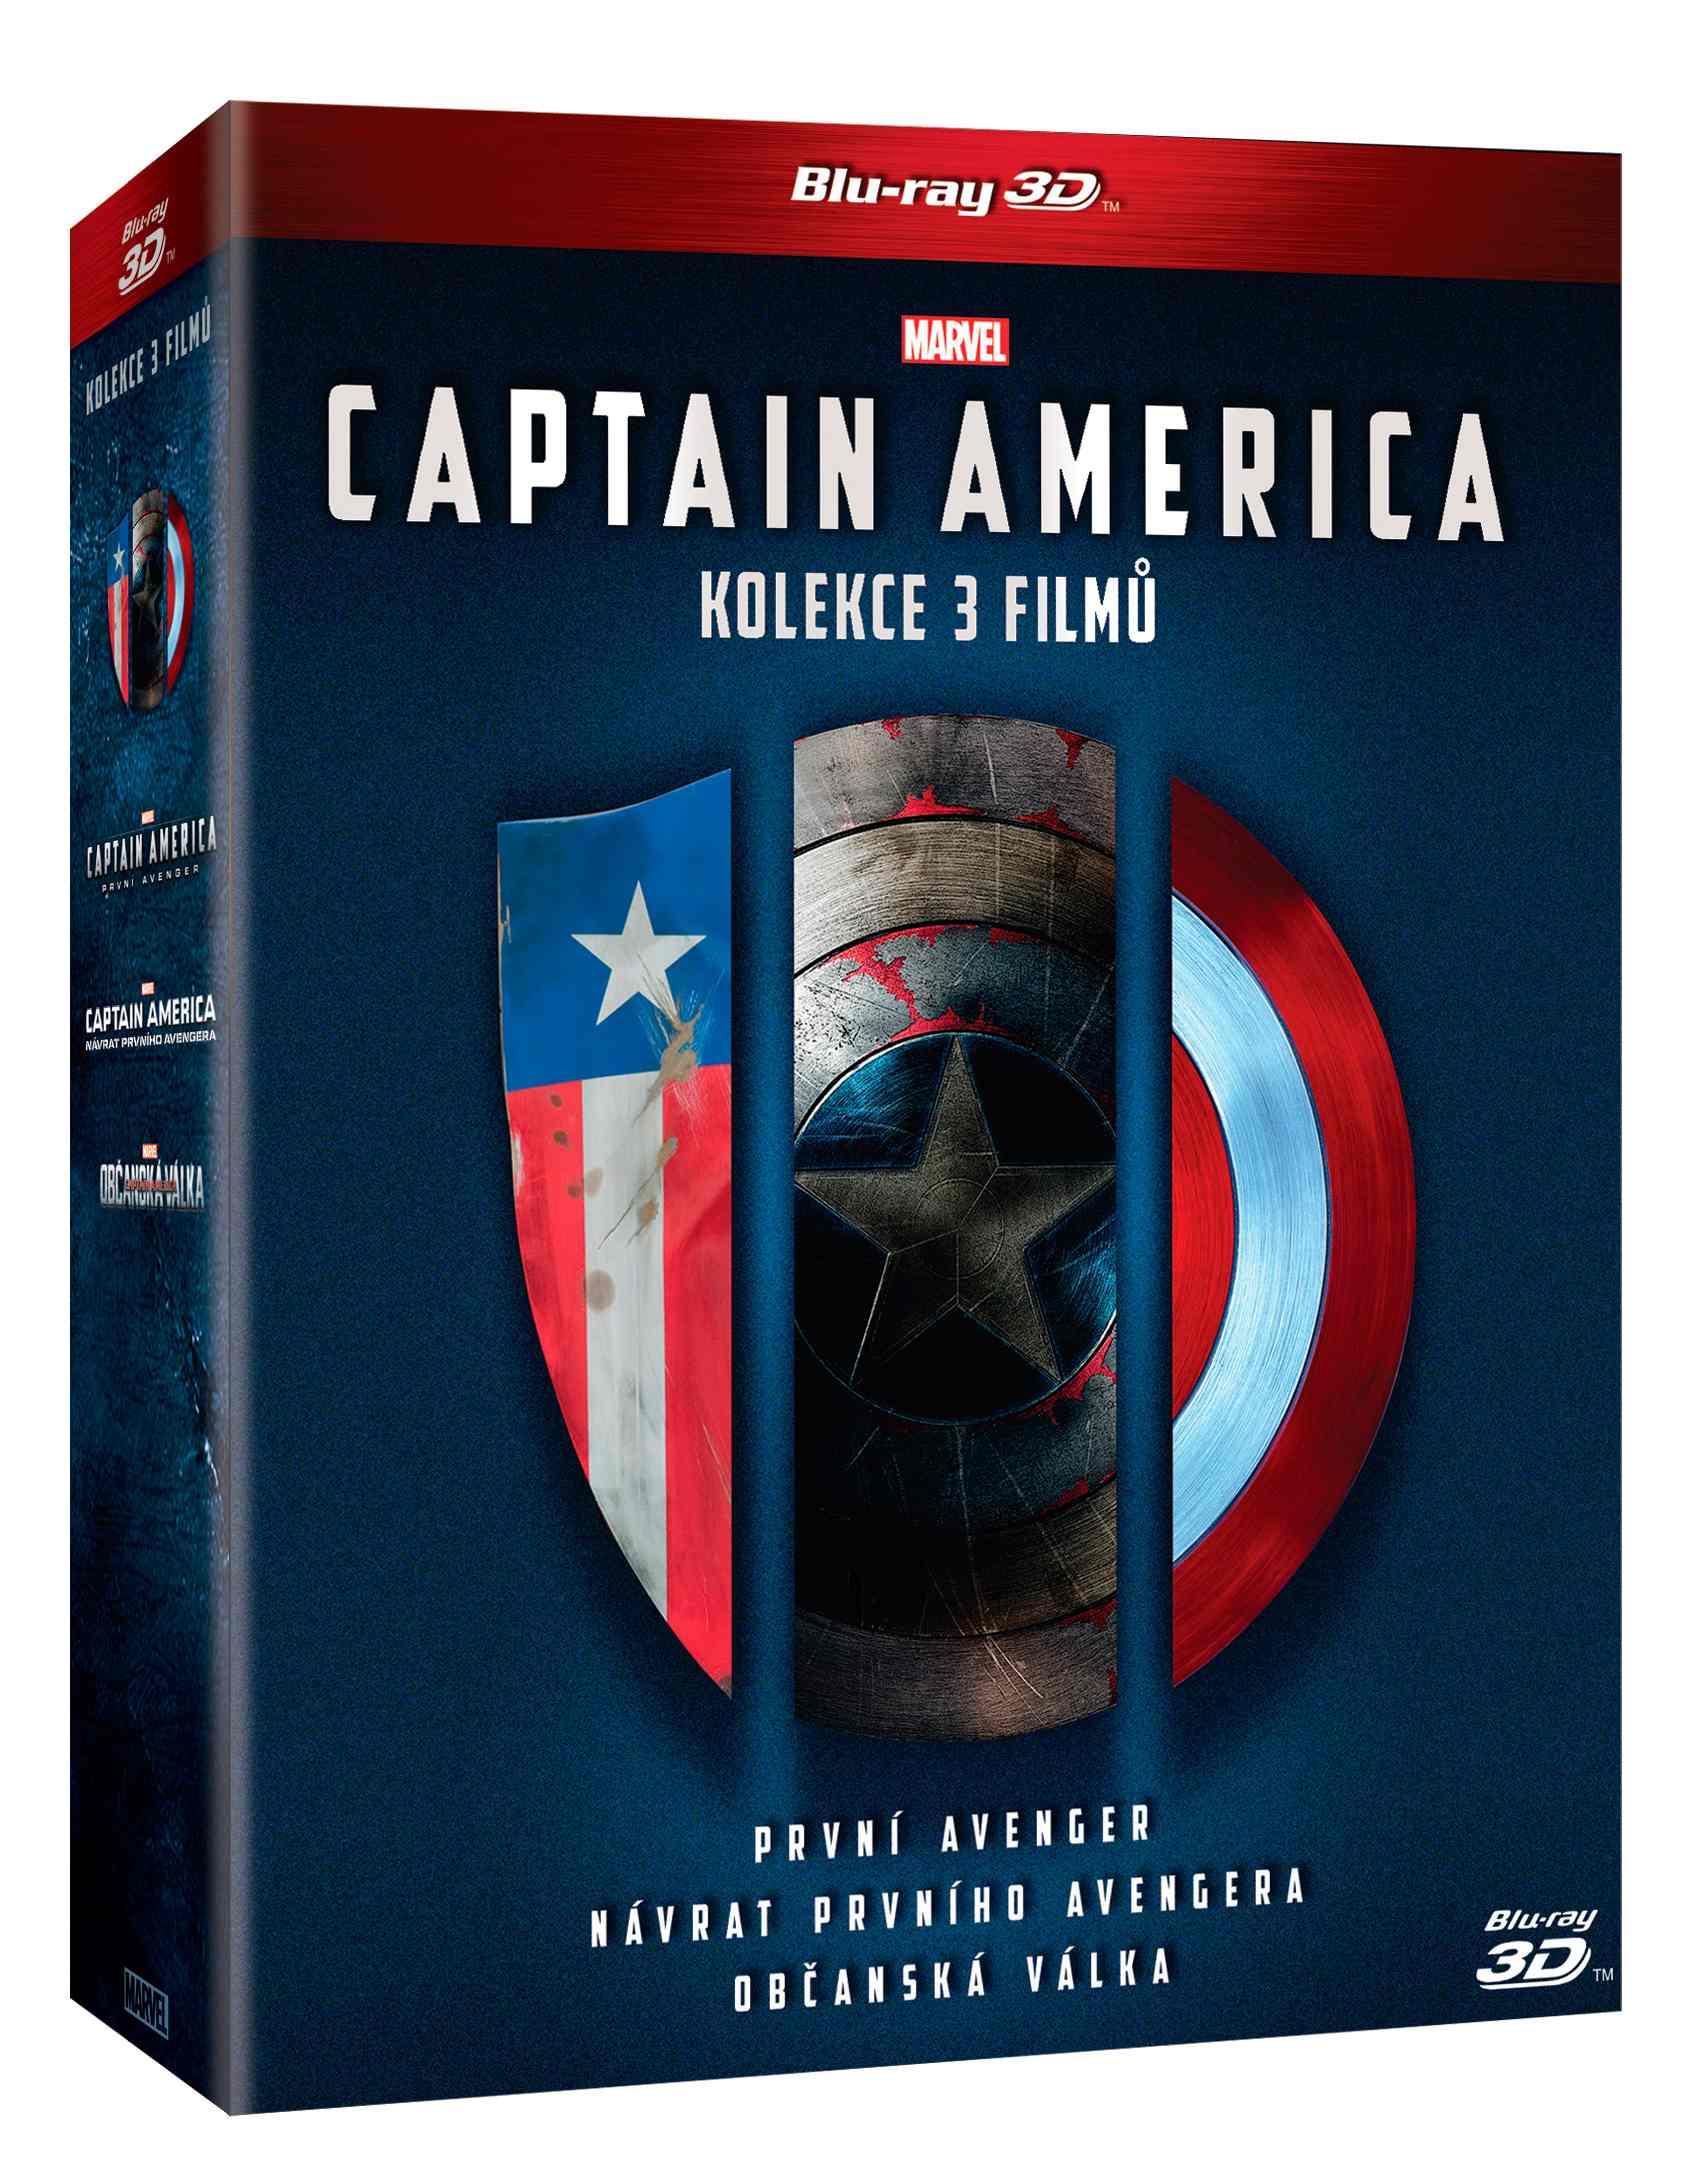 CAPTAIN AMERICA 1-3 KOLEKCE (6 BD) - Blu-ray 3D + 2D